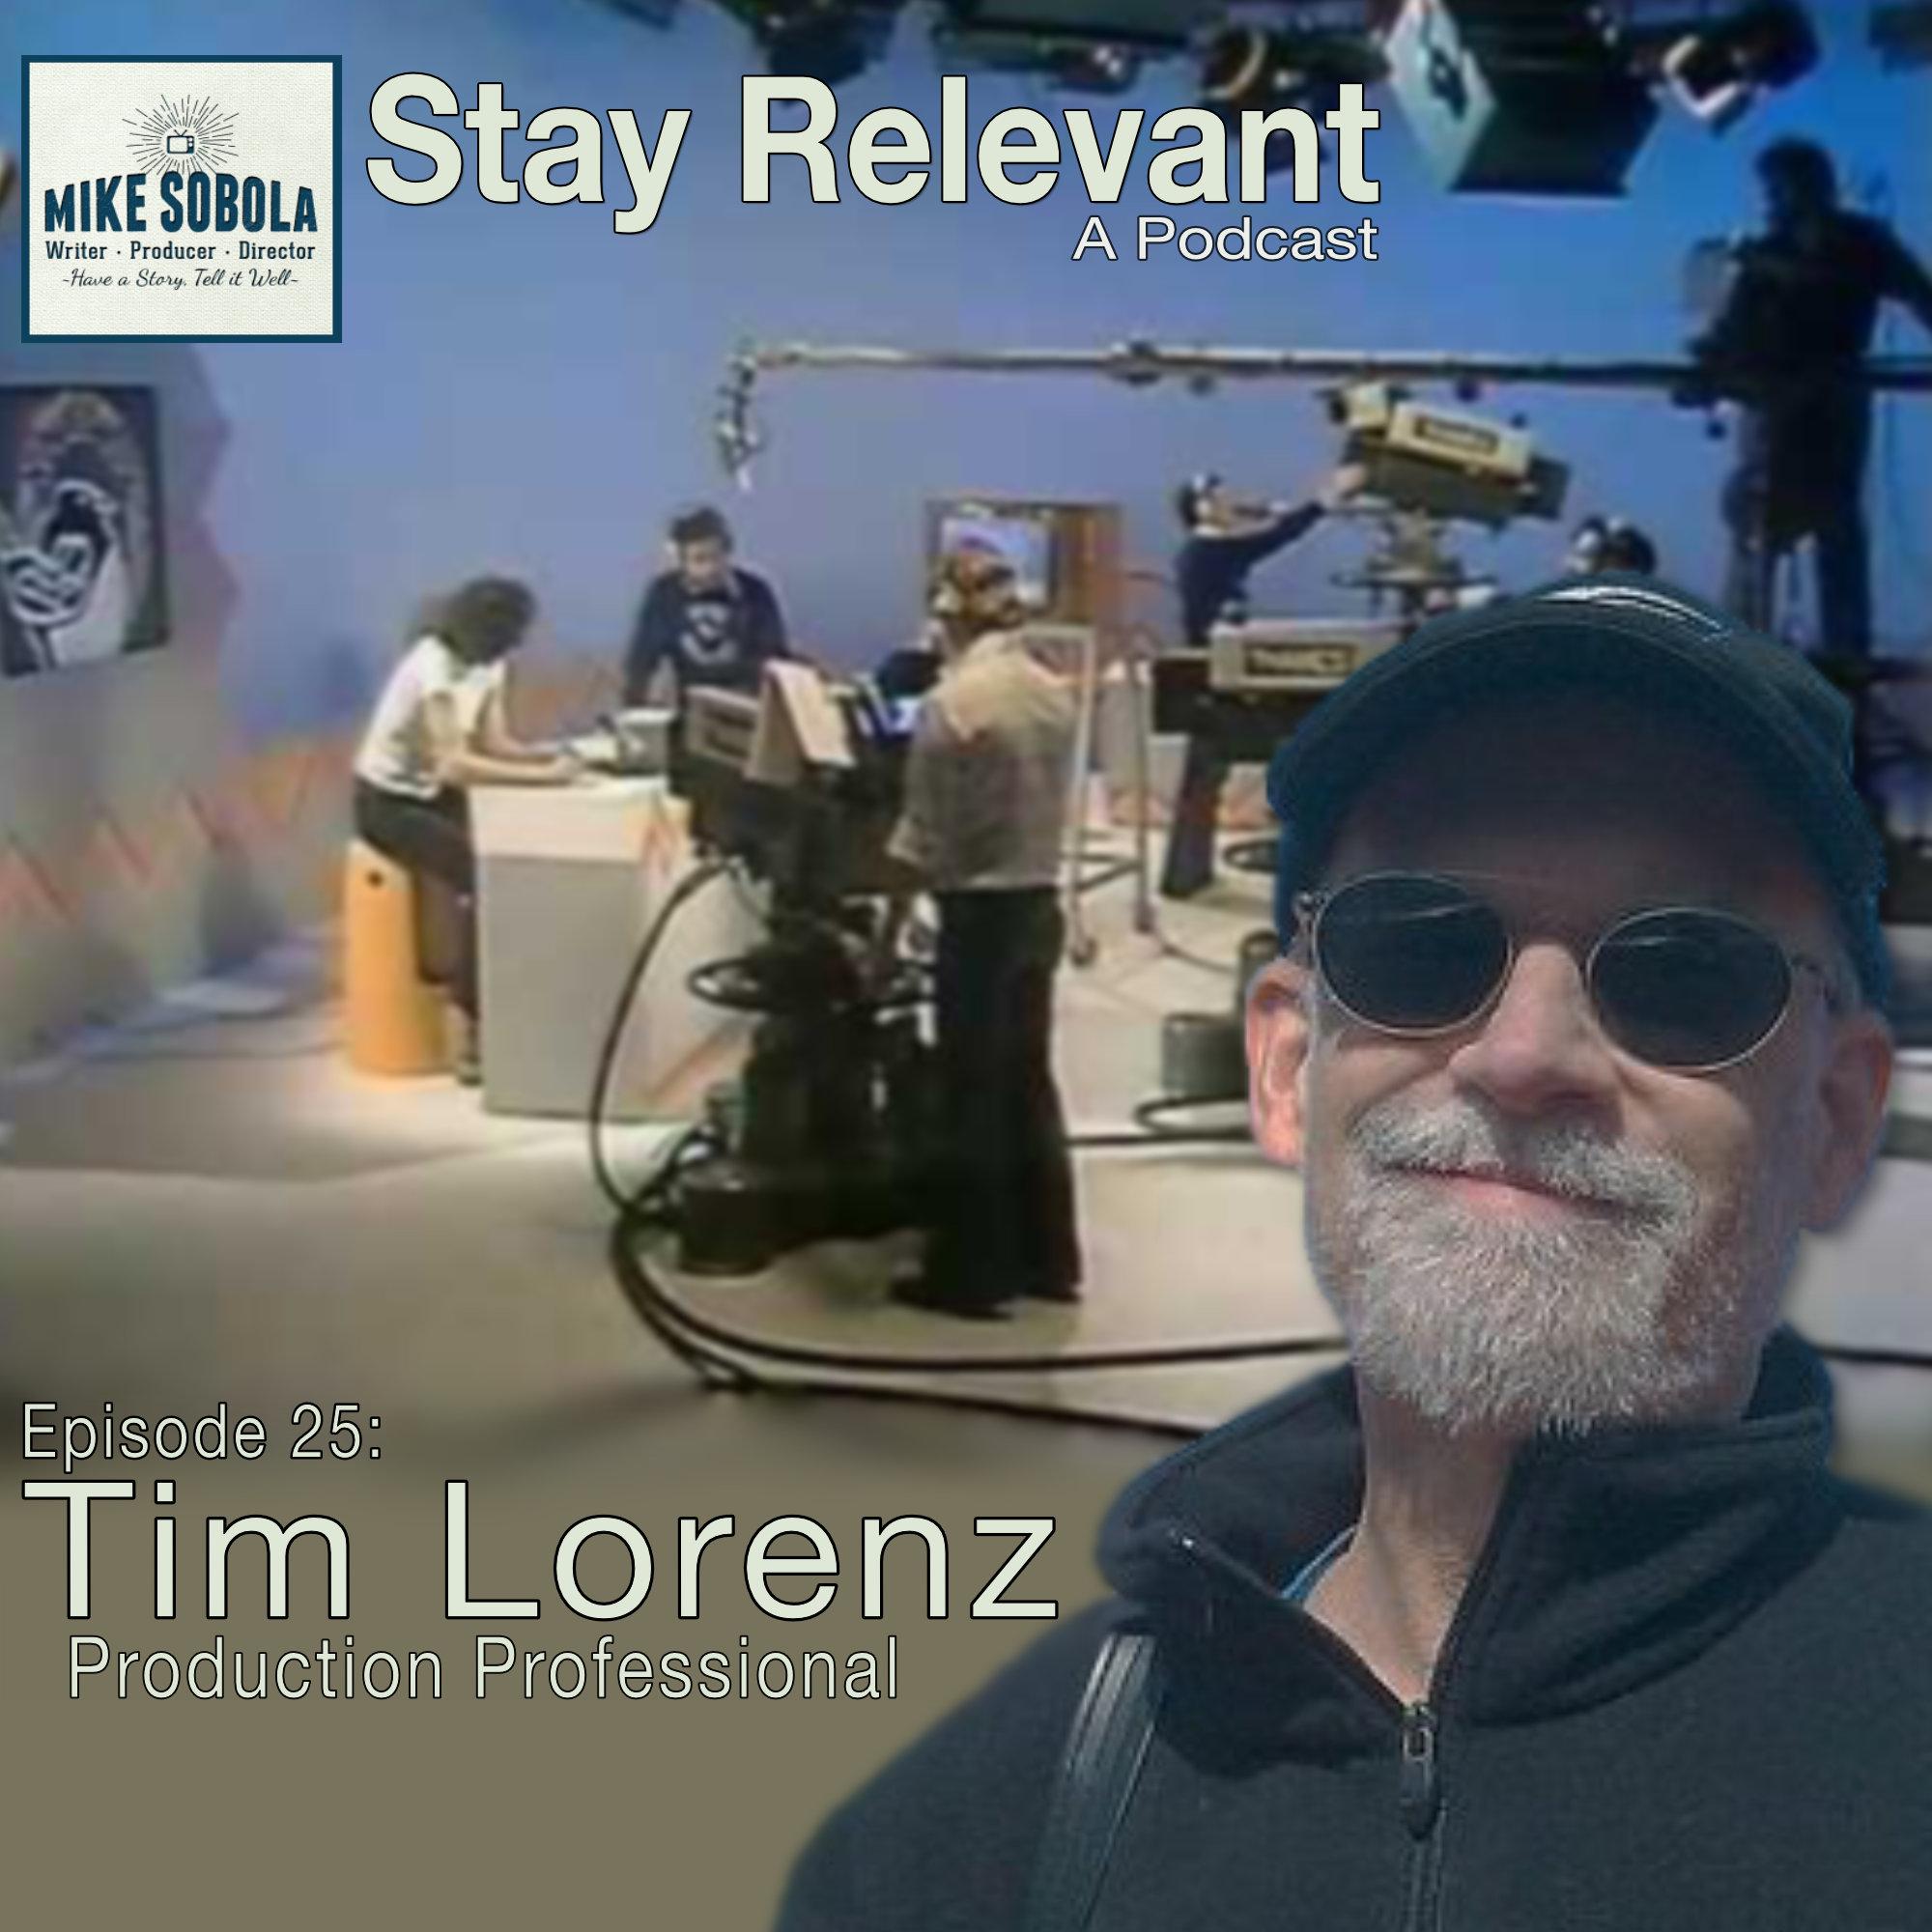 Tim Lorenz, Jimmy Buffet & Starwood in Aspen